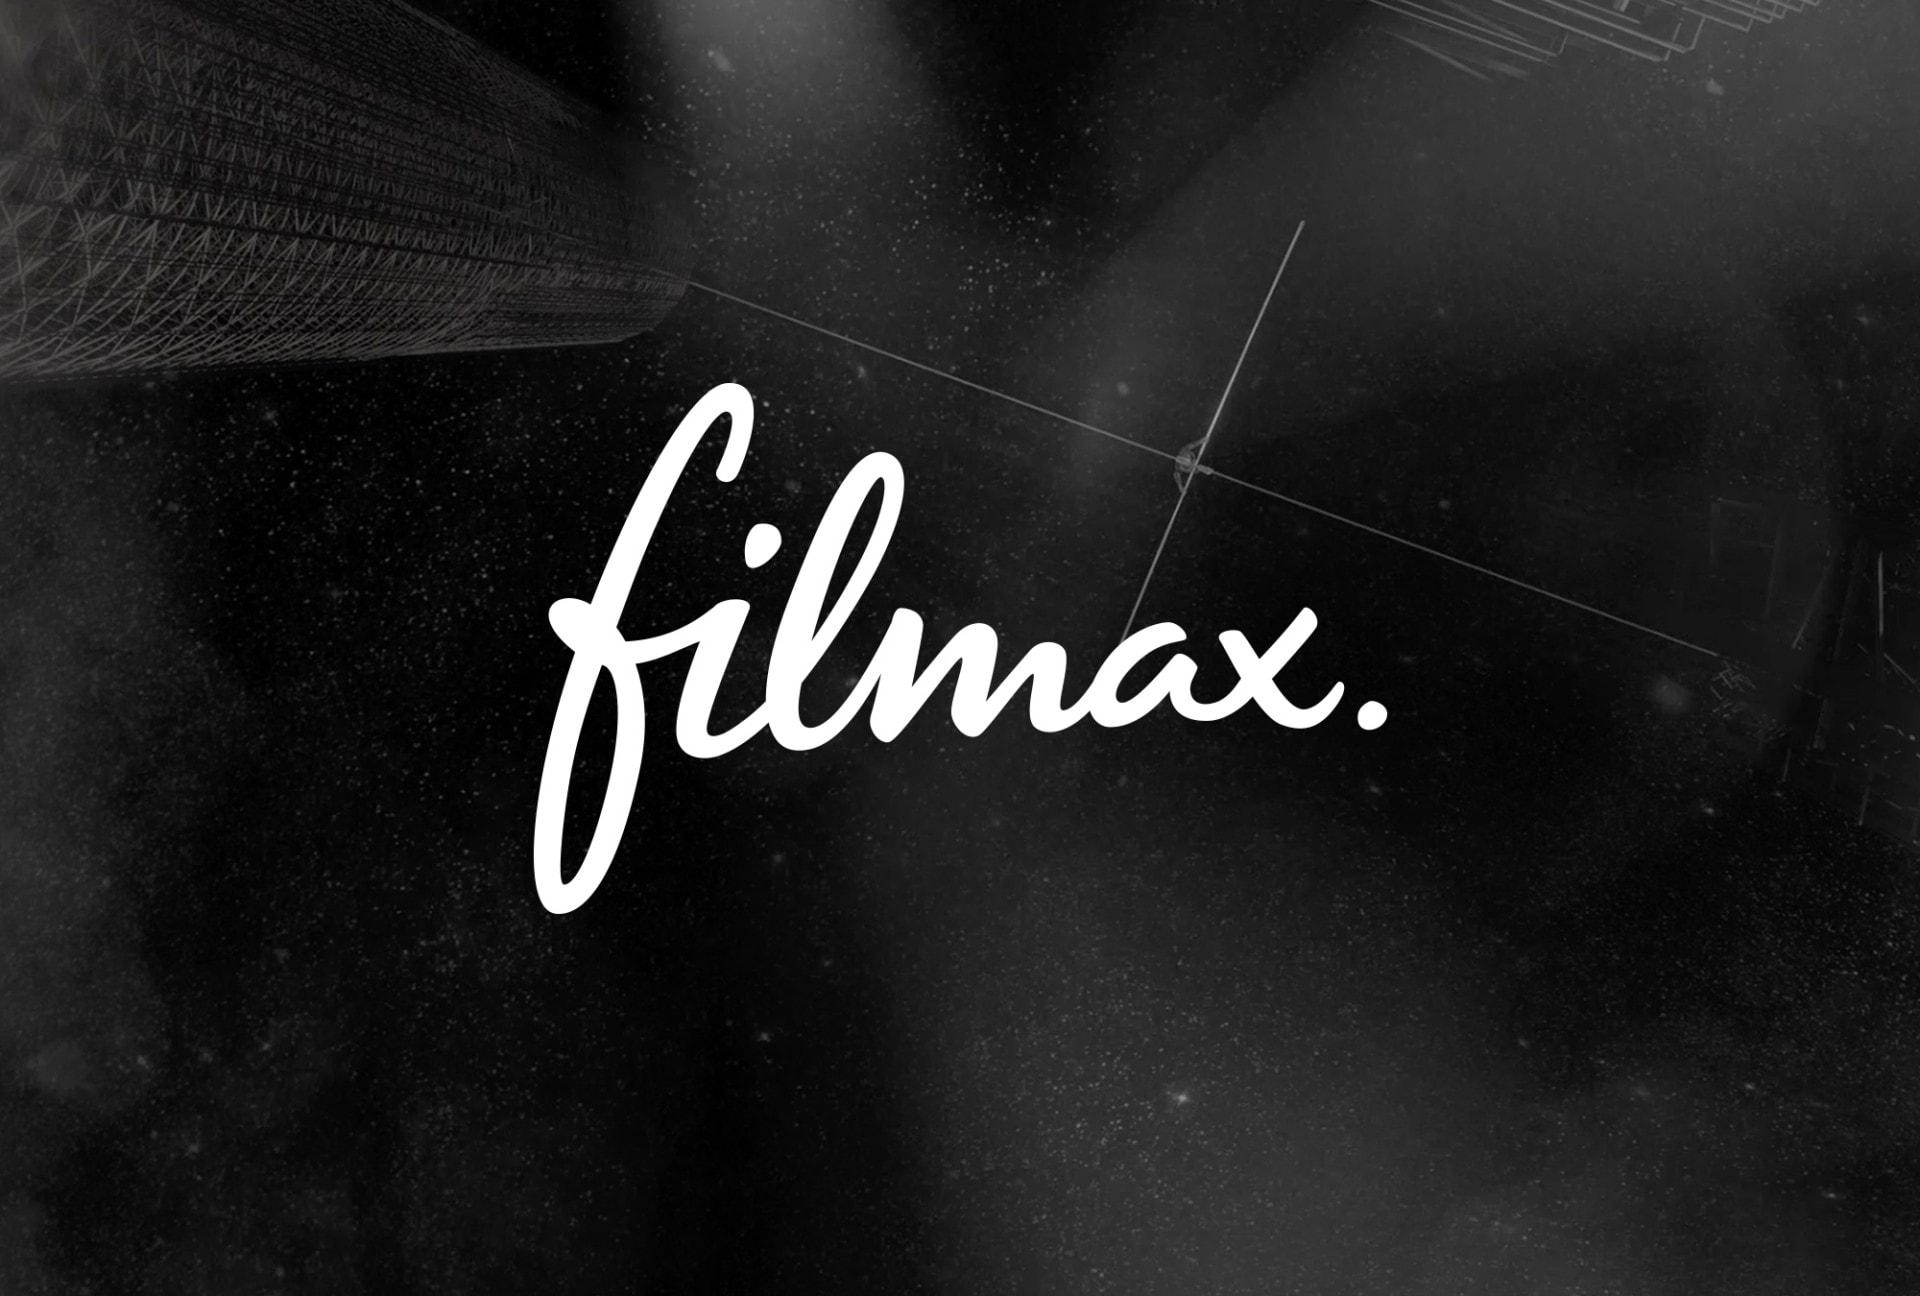 Filmax